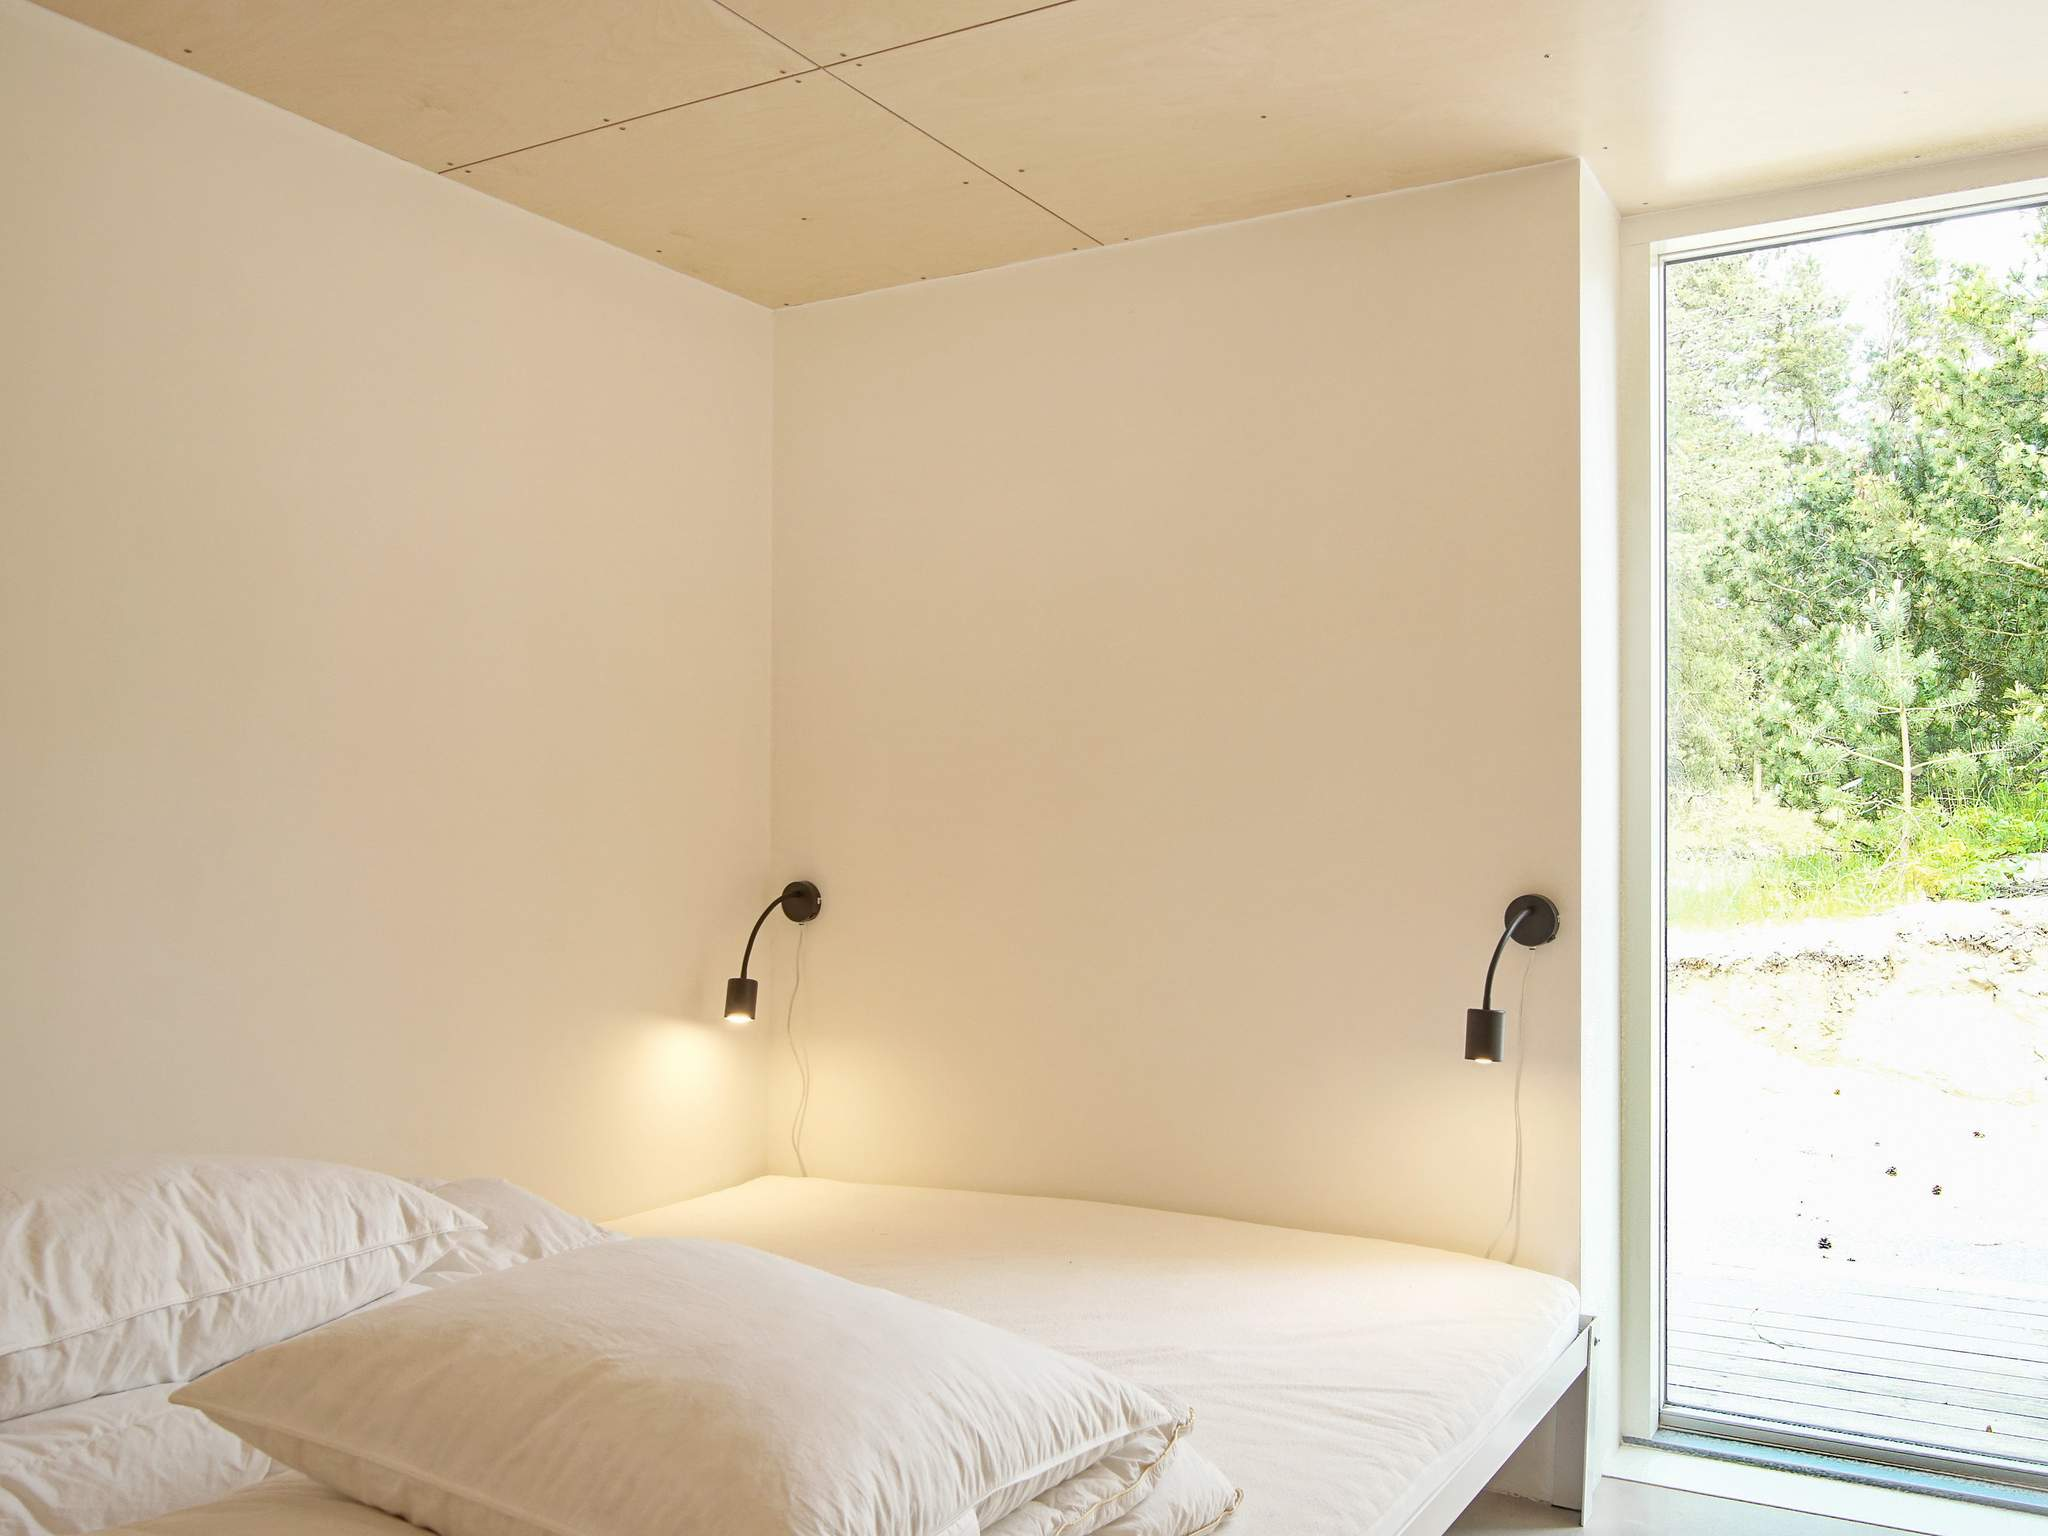 Ferienhaus Balka Strand (2354119), Balke, , Bornholm, Dänemark, Bild 4